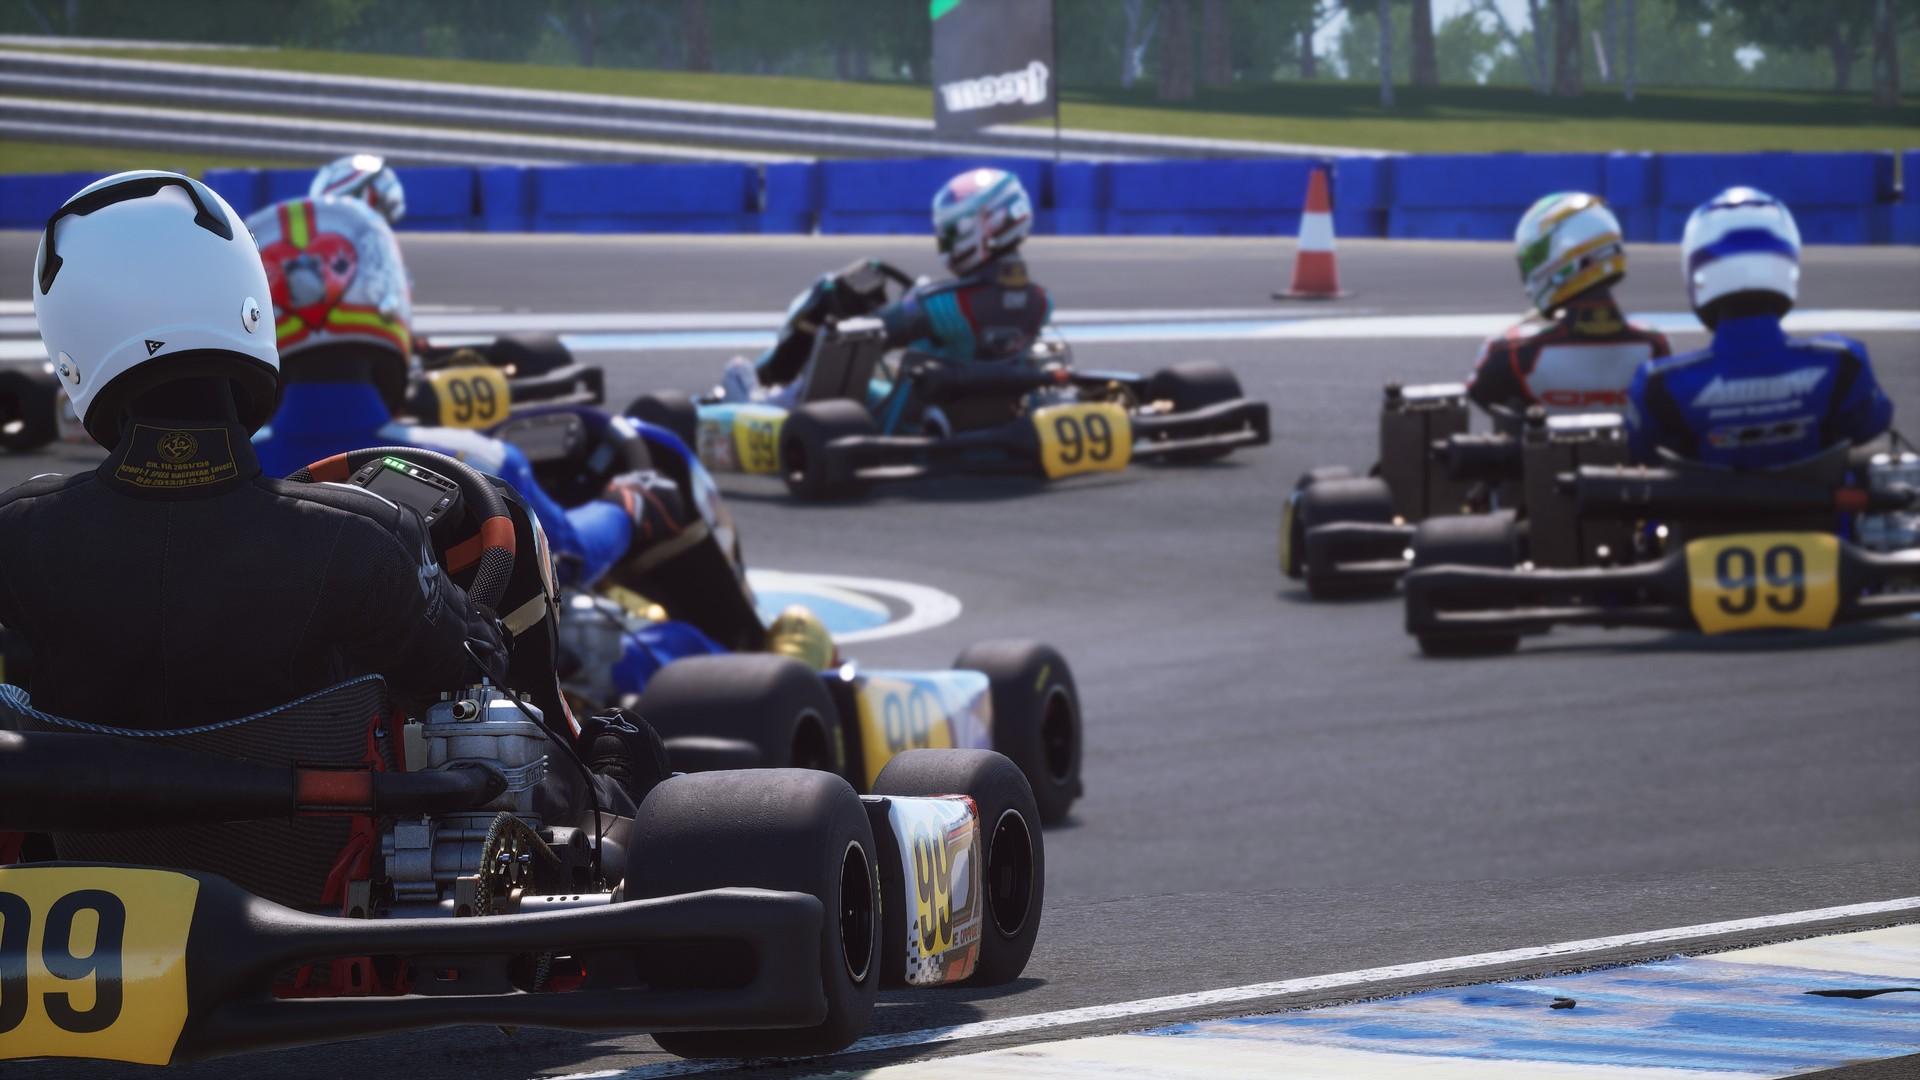 kart racing pro full crack